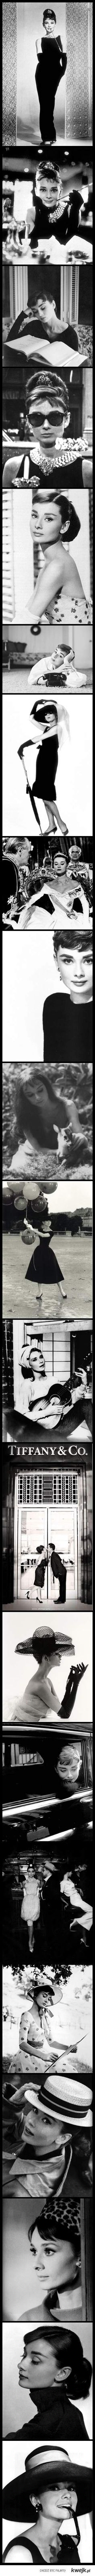 Audrey Hepburn peopl, breakfast at tiffanys, audrey hepburn, style icons, audreyhepburn, movi, beauti, actress, role models